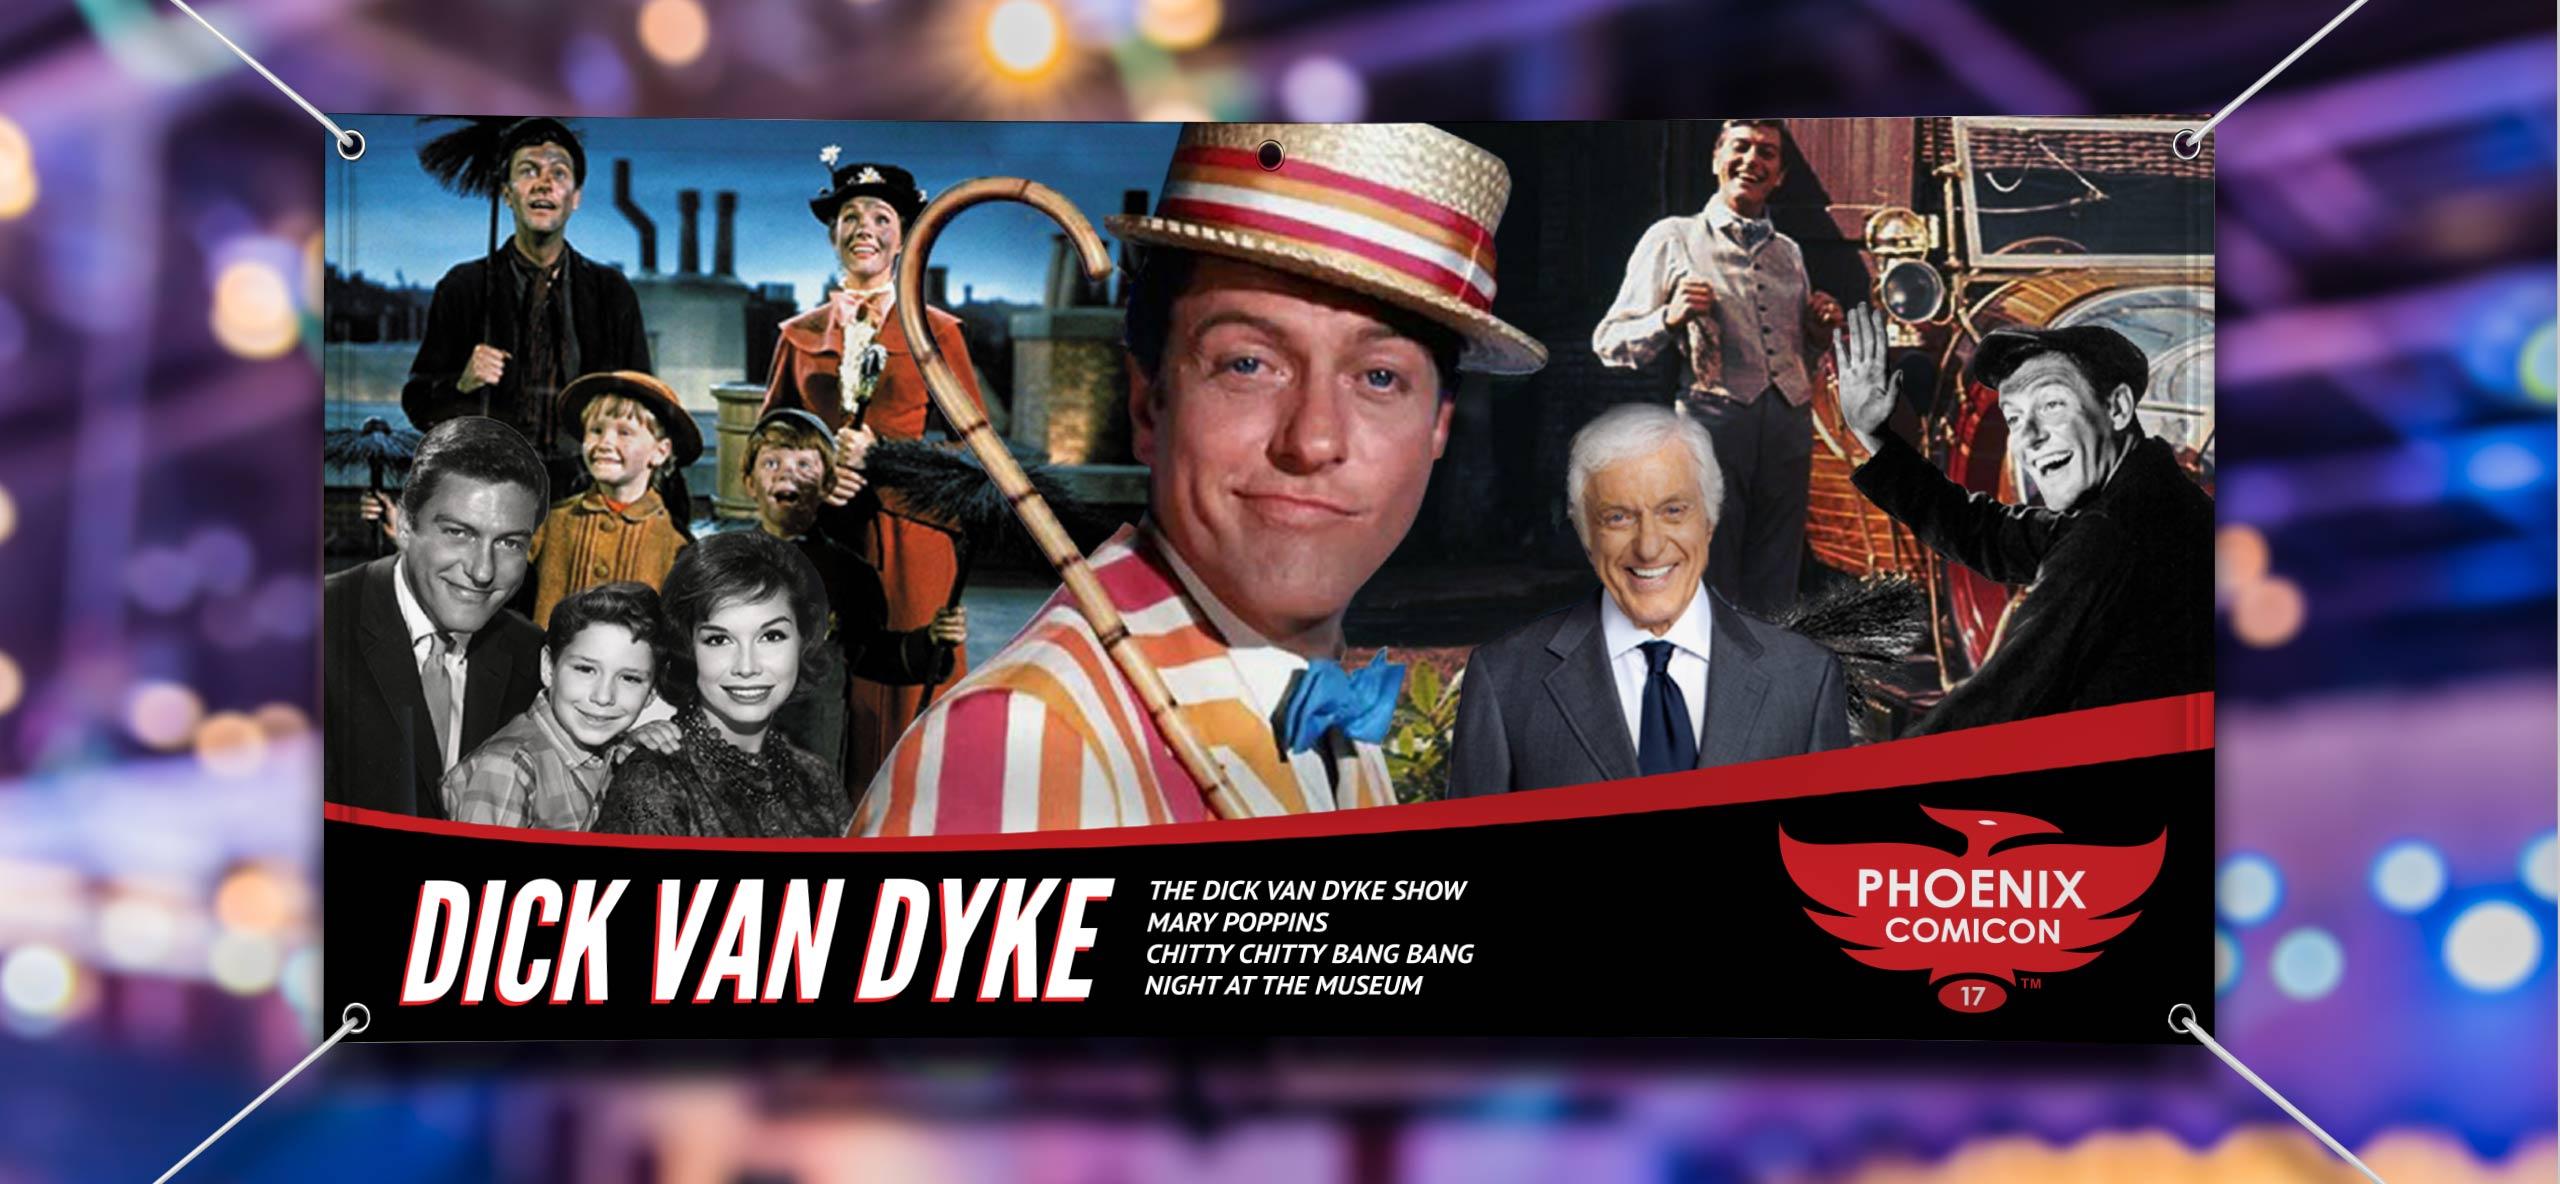 Dick Van Dyke Guest Banner